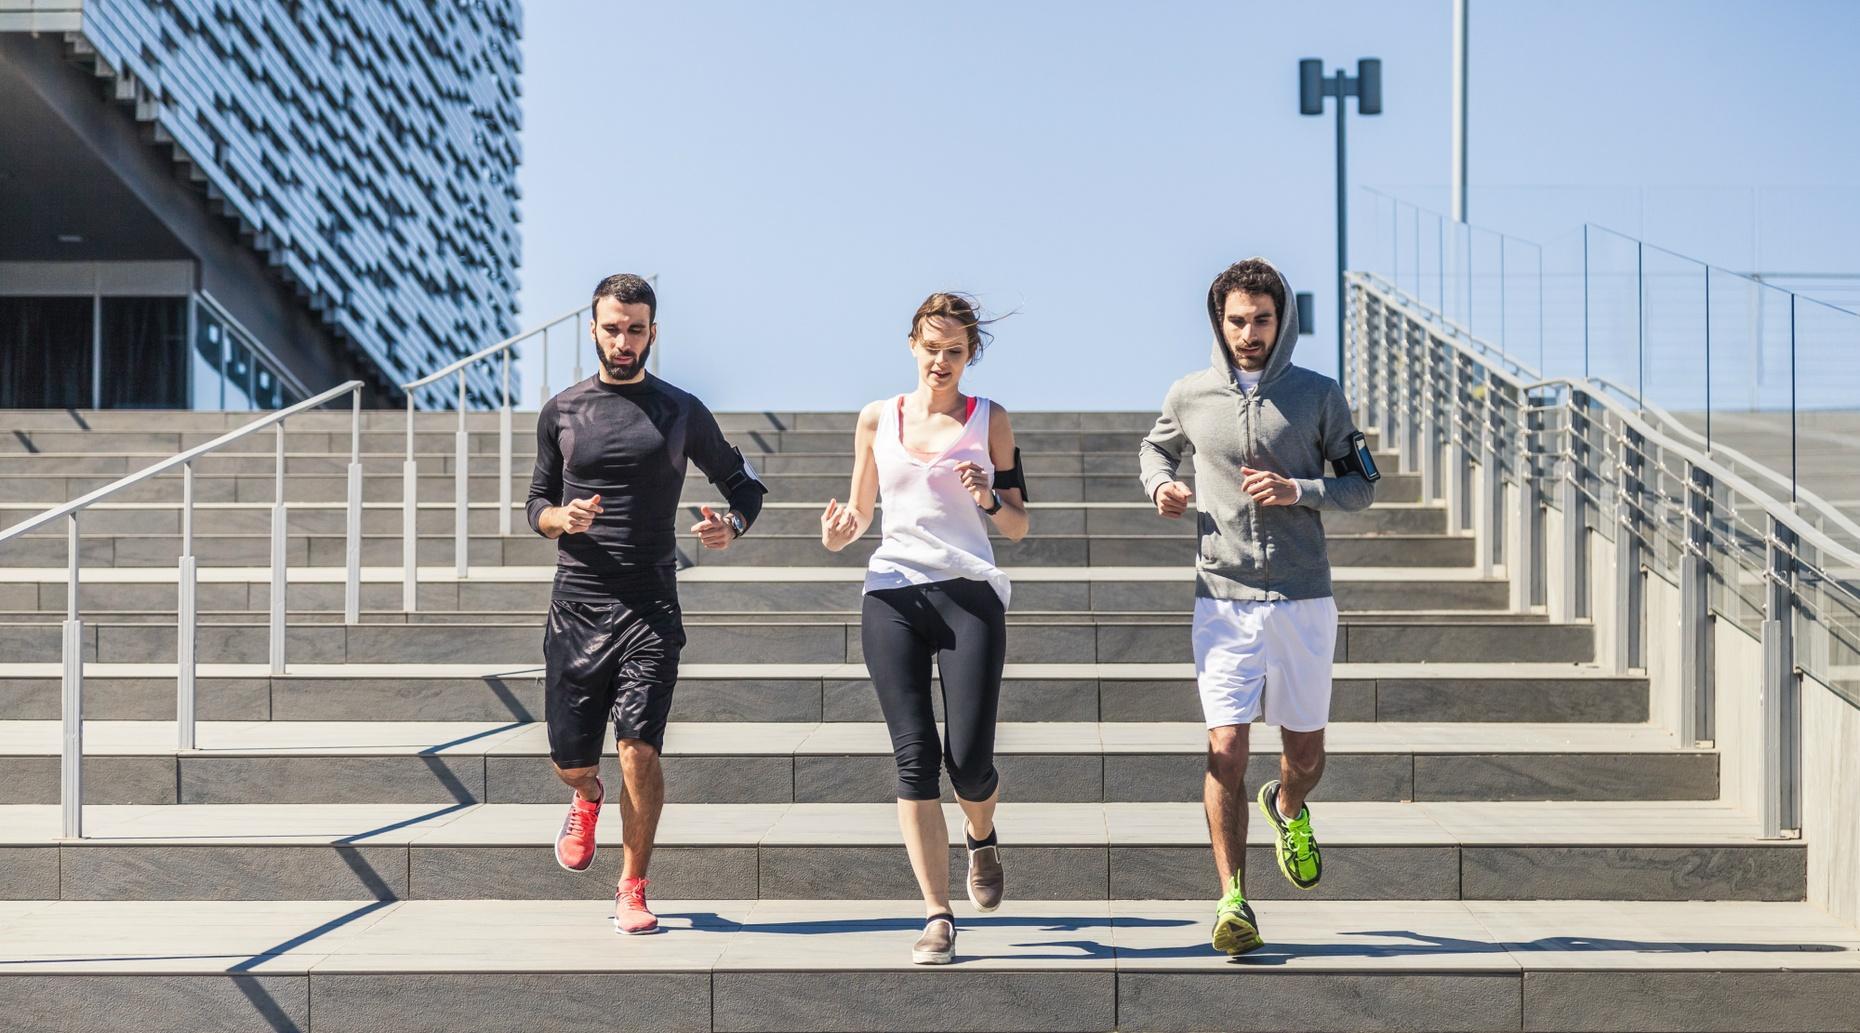 Toronto History & Highlights Running Tour